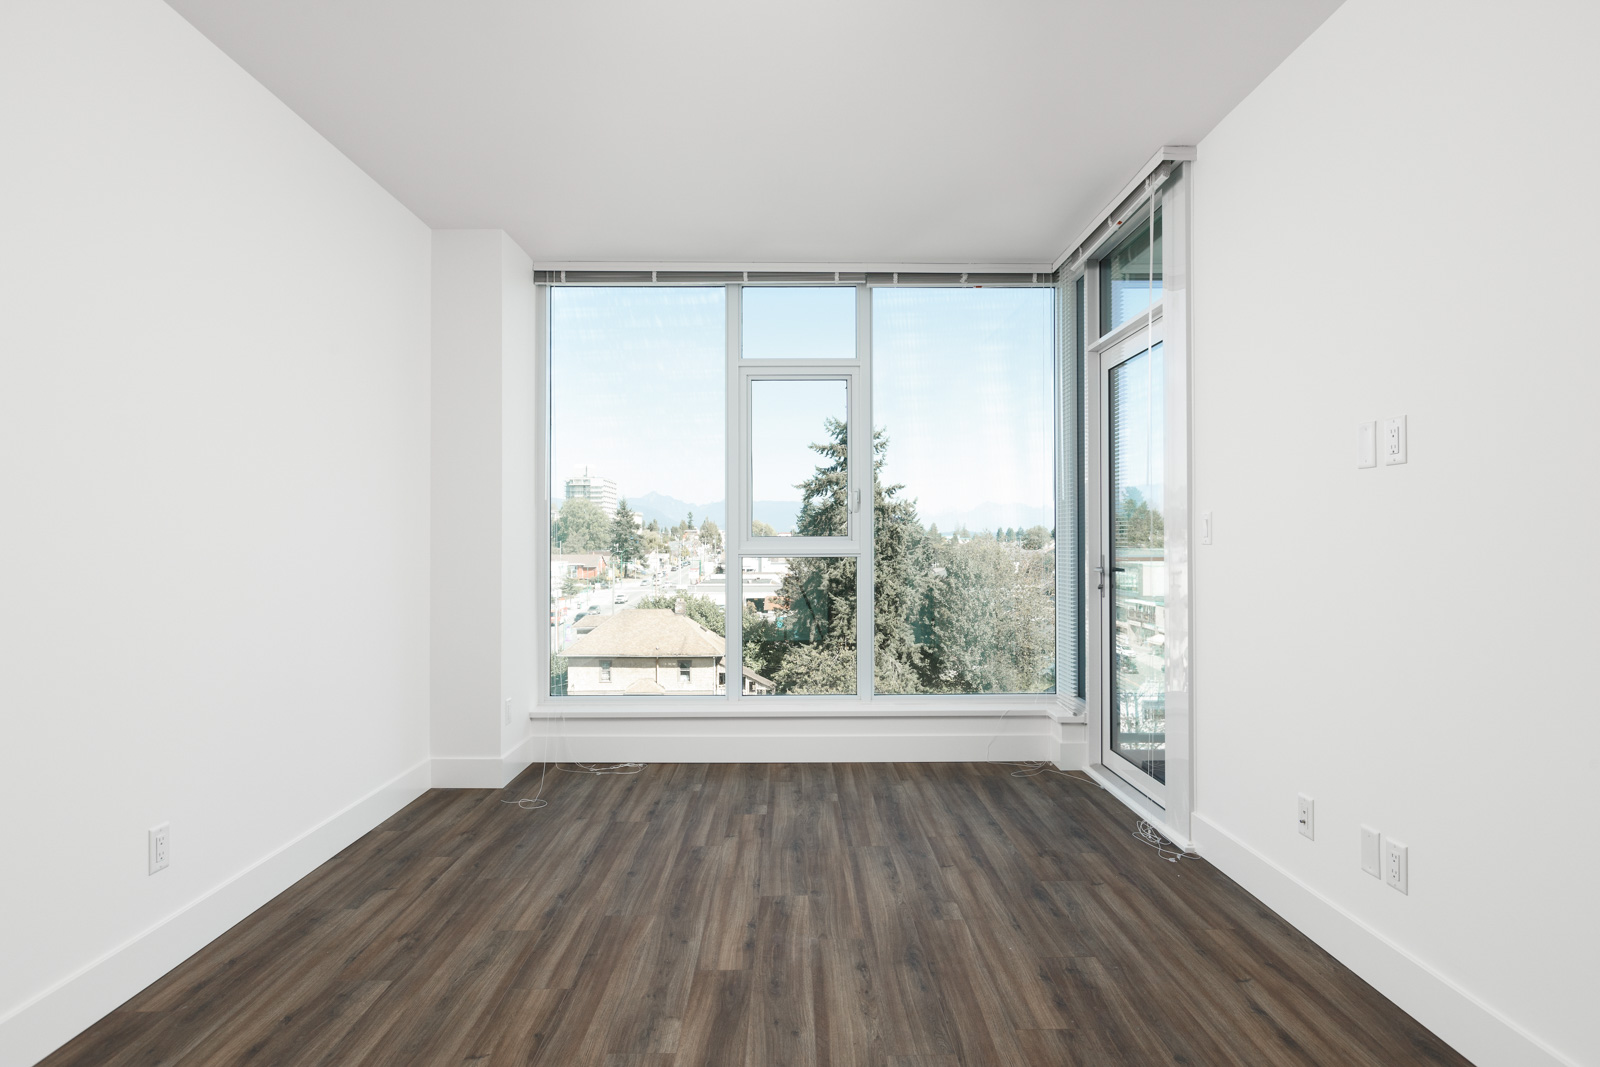 Condo living room in Kings Crossing condo rental property in Highgate village and Edmonds neighbourhood in Burnaby